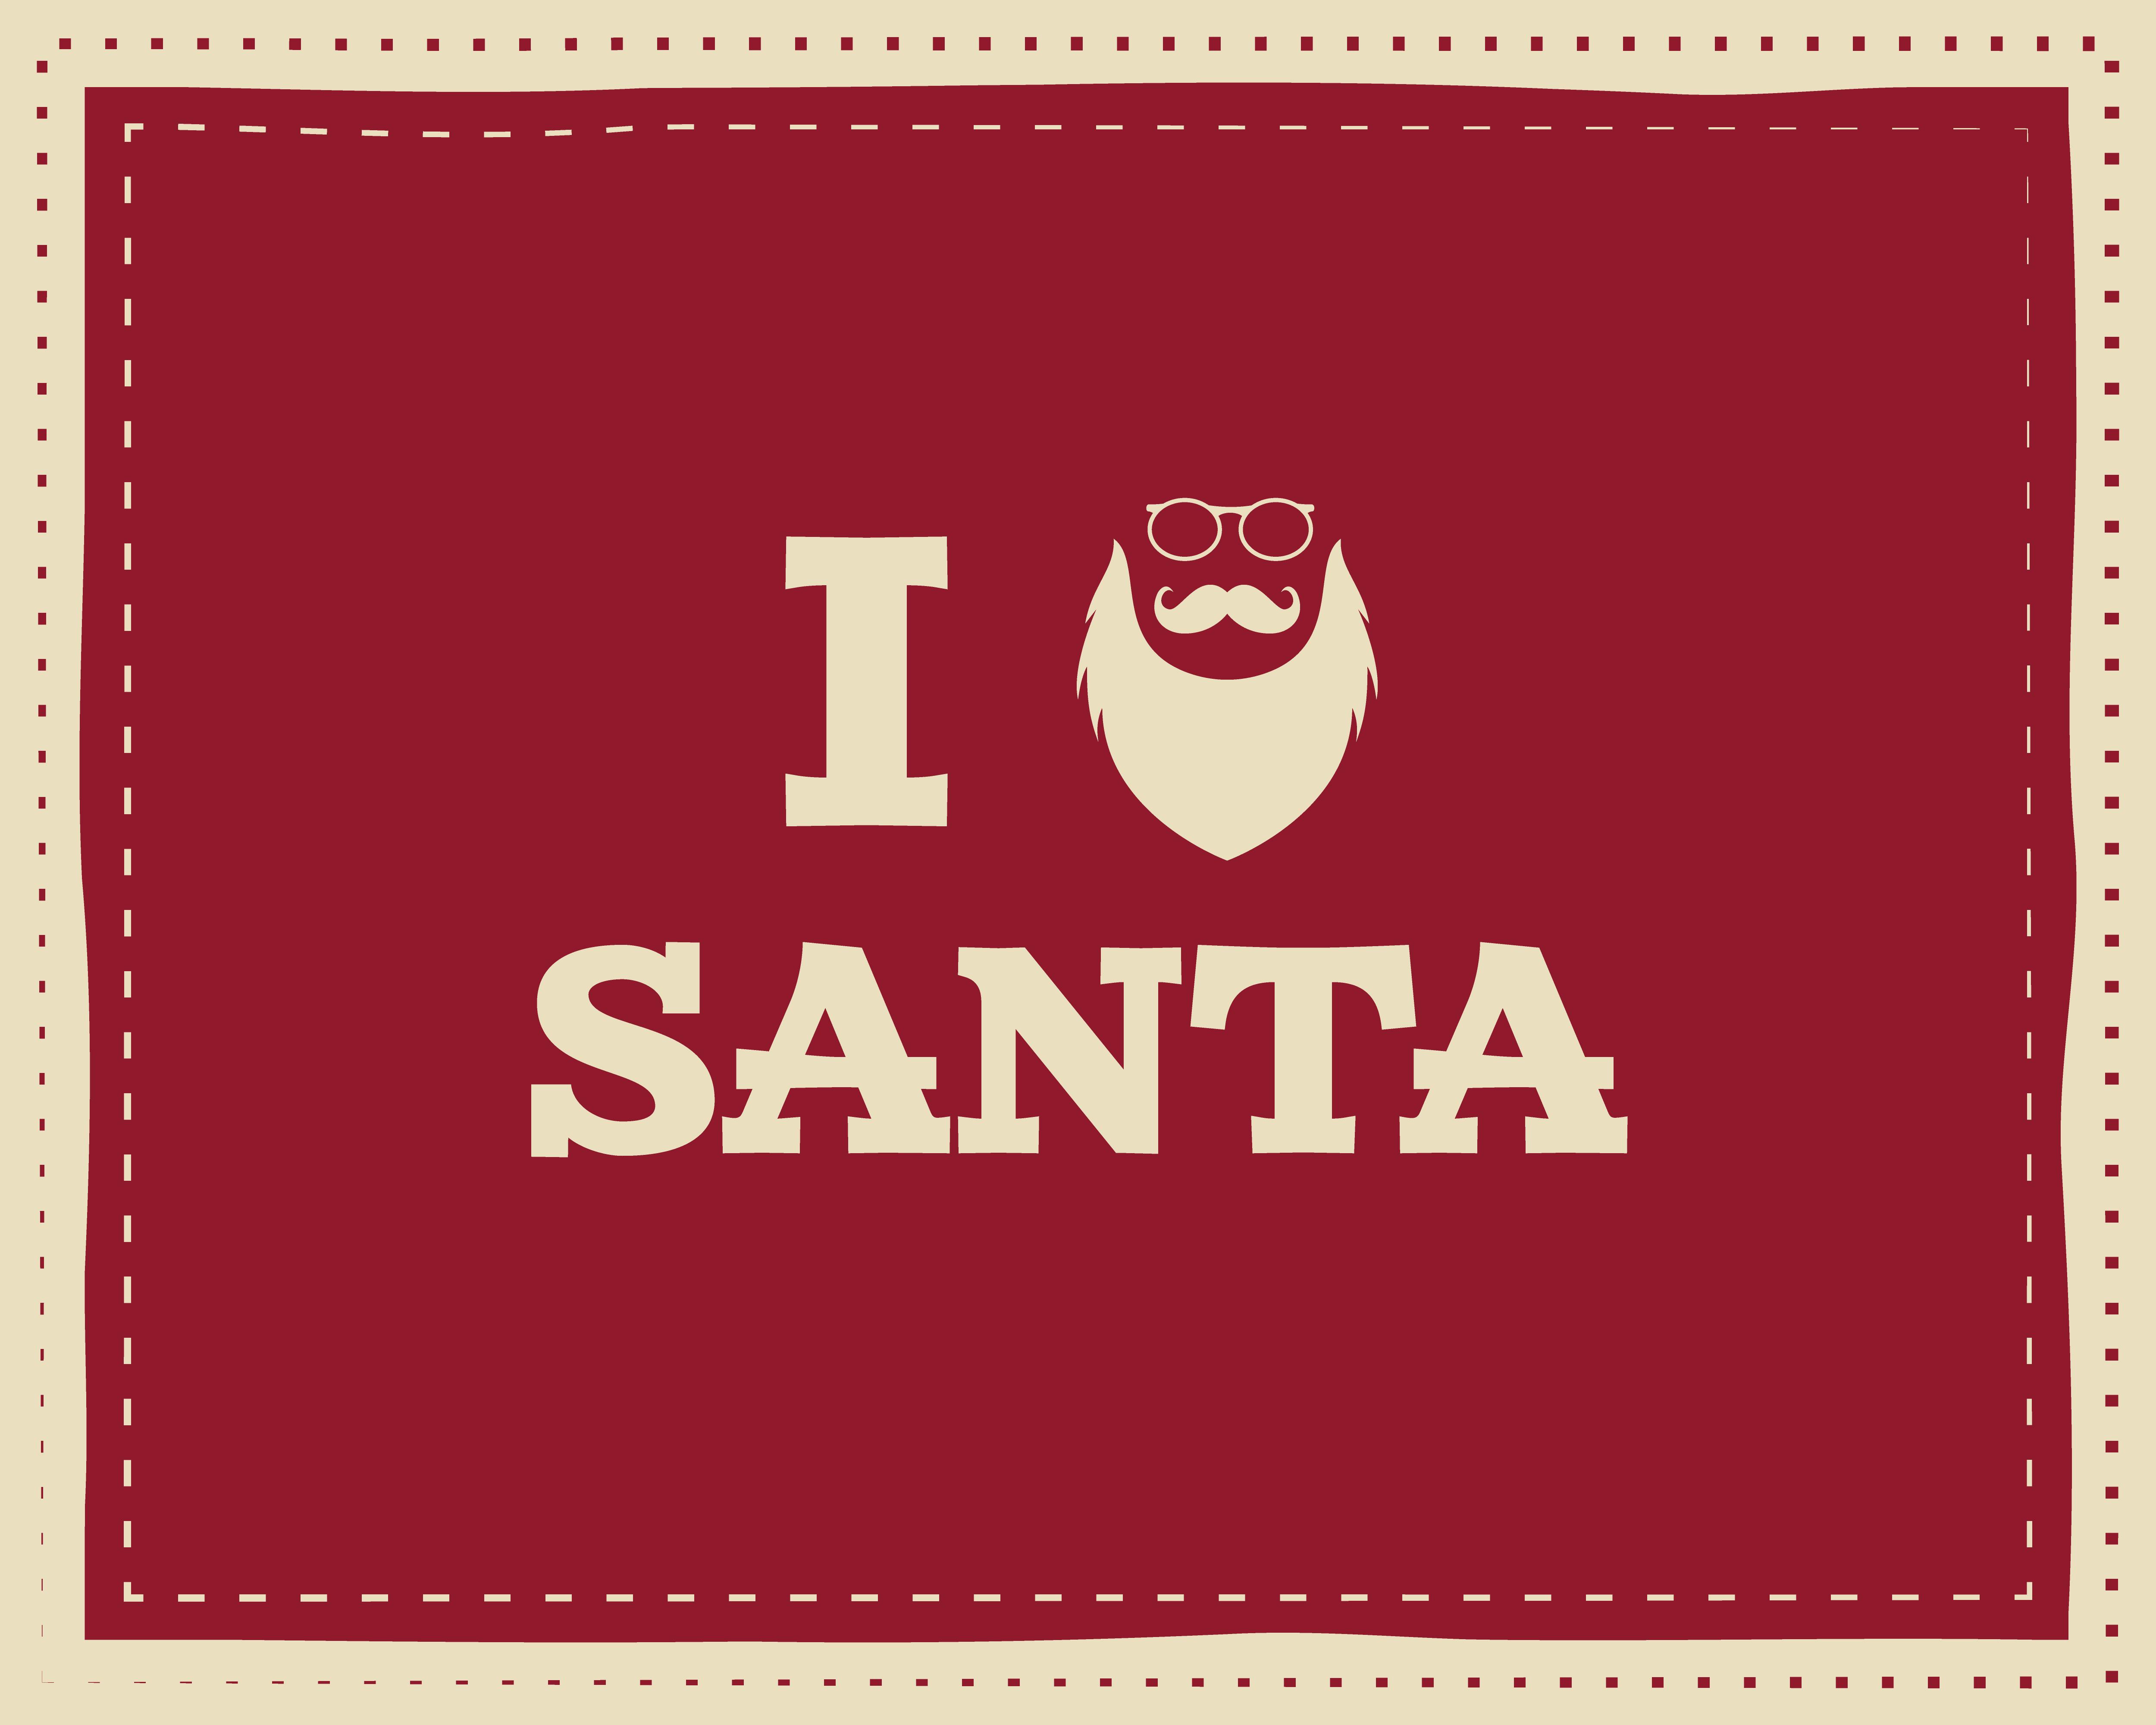 christmas unique funny sign quote background design for kids love santa nice bright palette. Black Bedroom Furniture Sets. Home Design Ideas